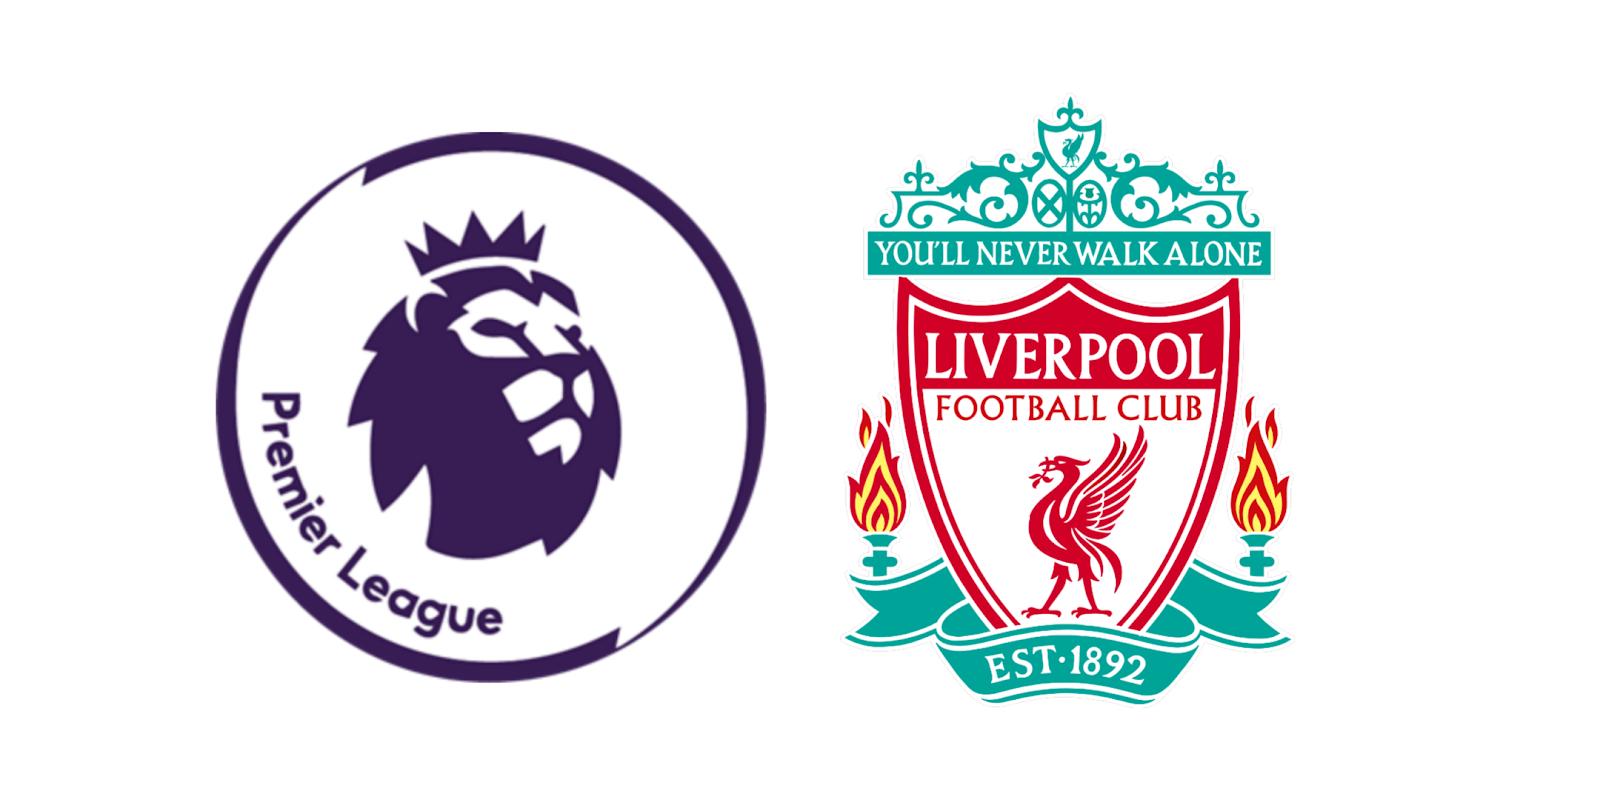 Jadual Perlawanan Liverpool Musim 2019/2020